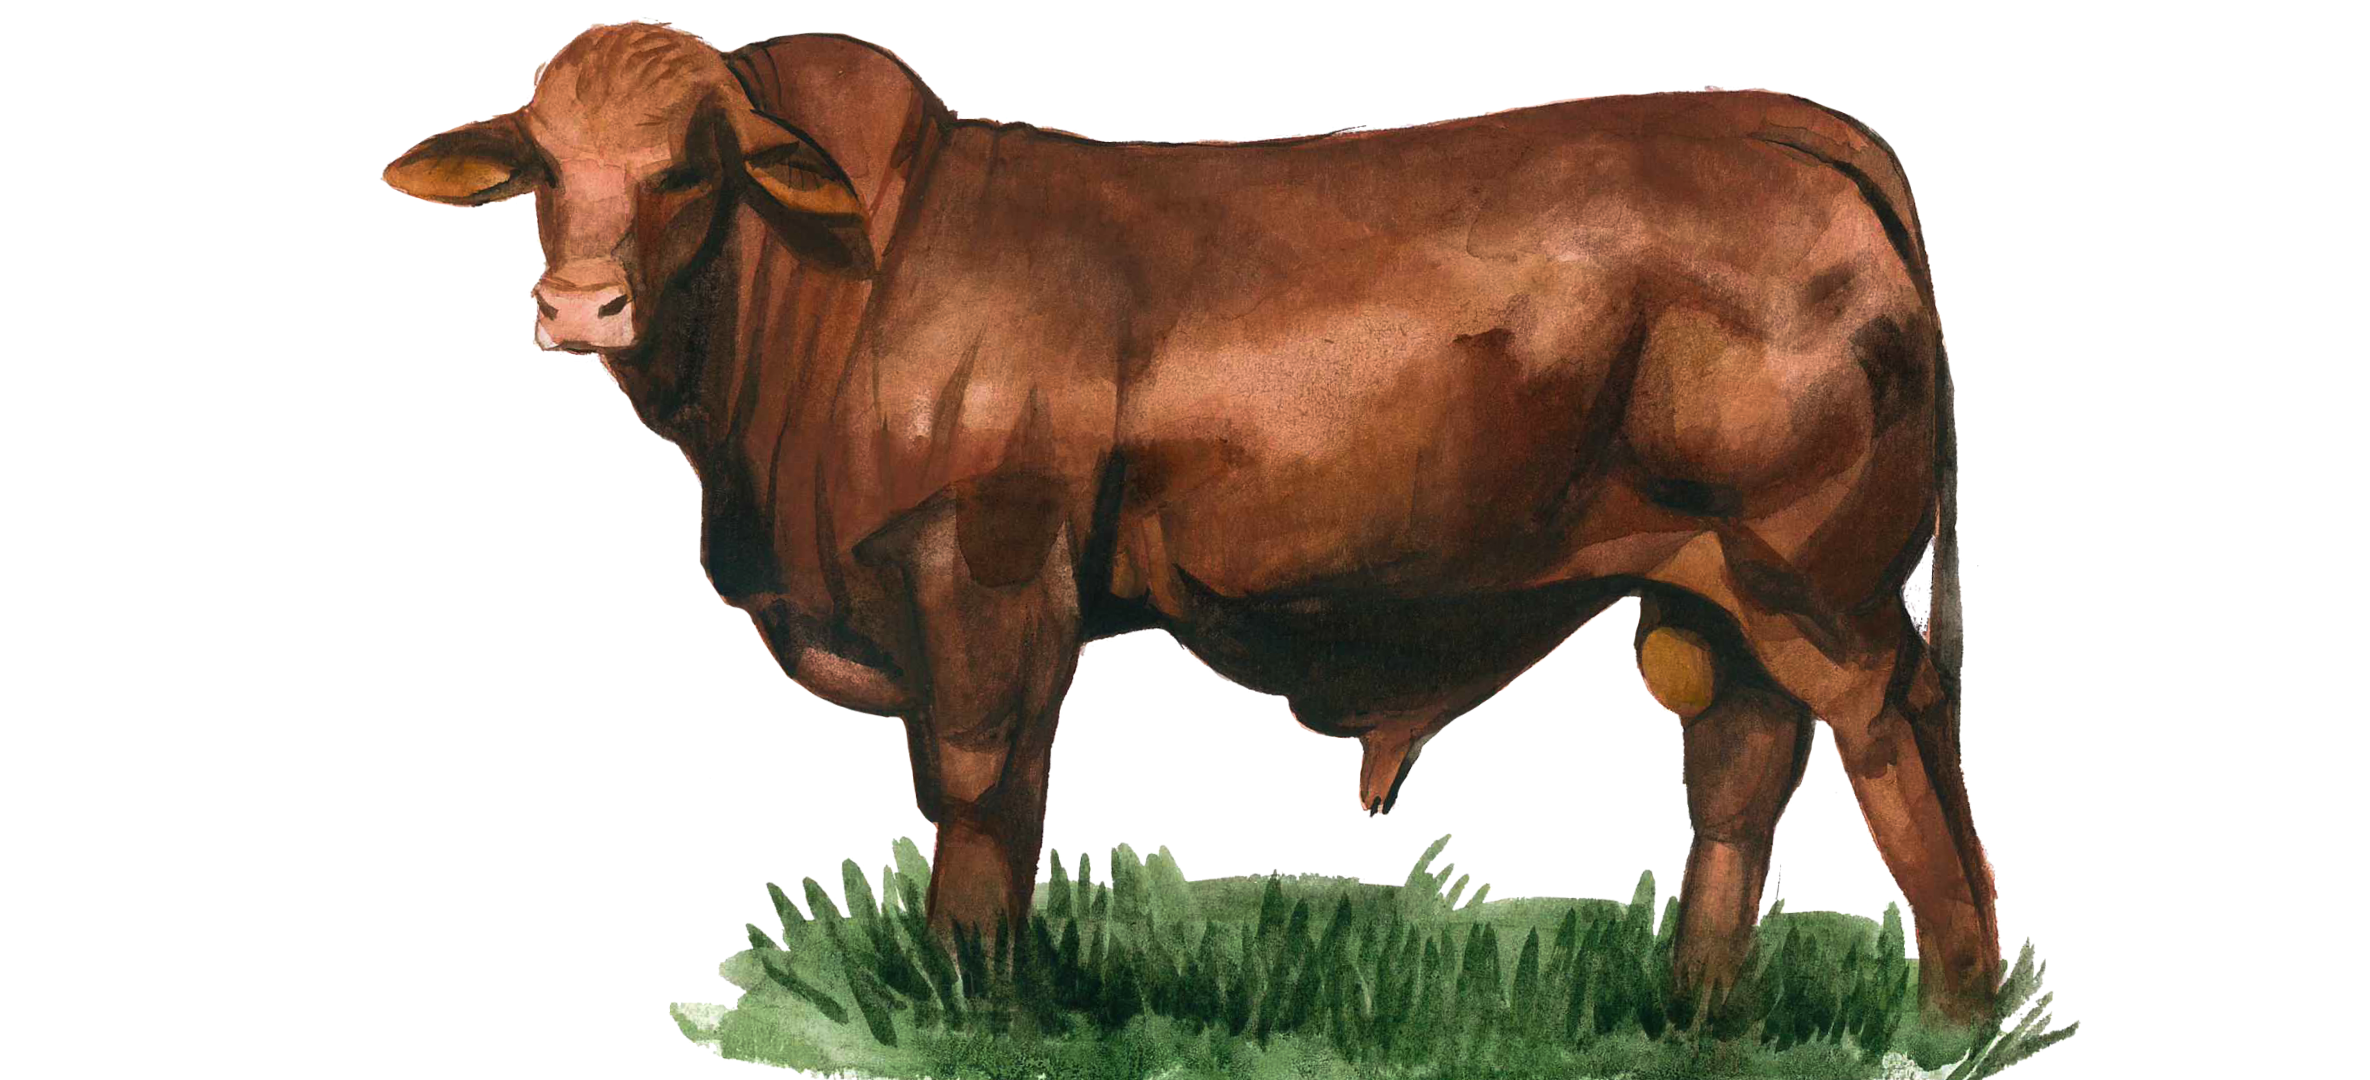 Порода коров Санта-Гертруда